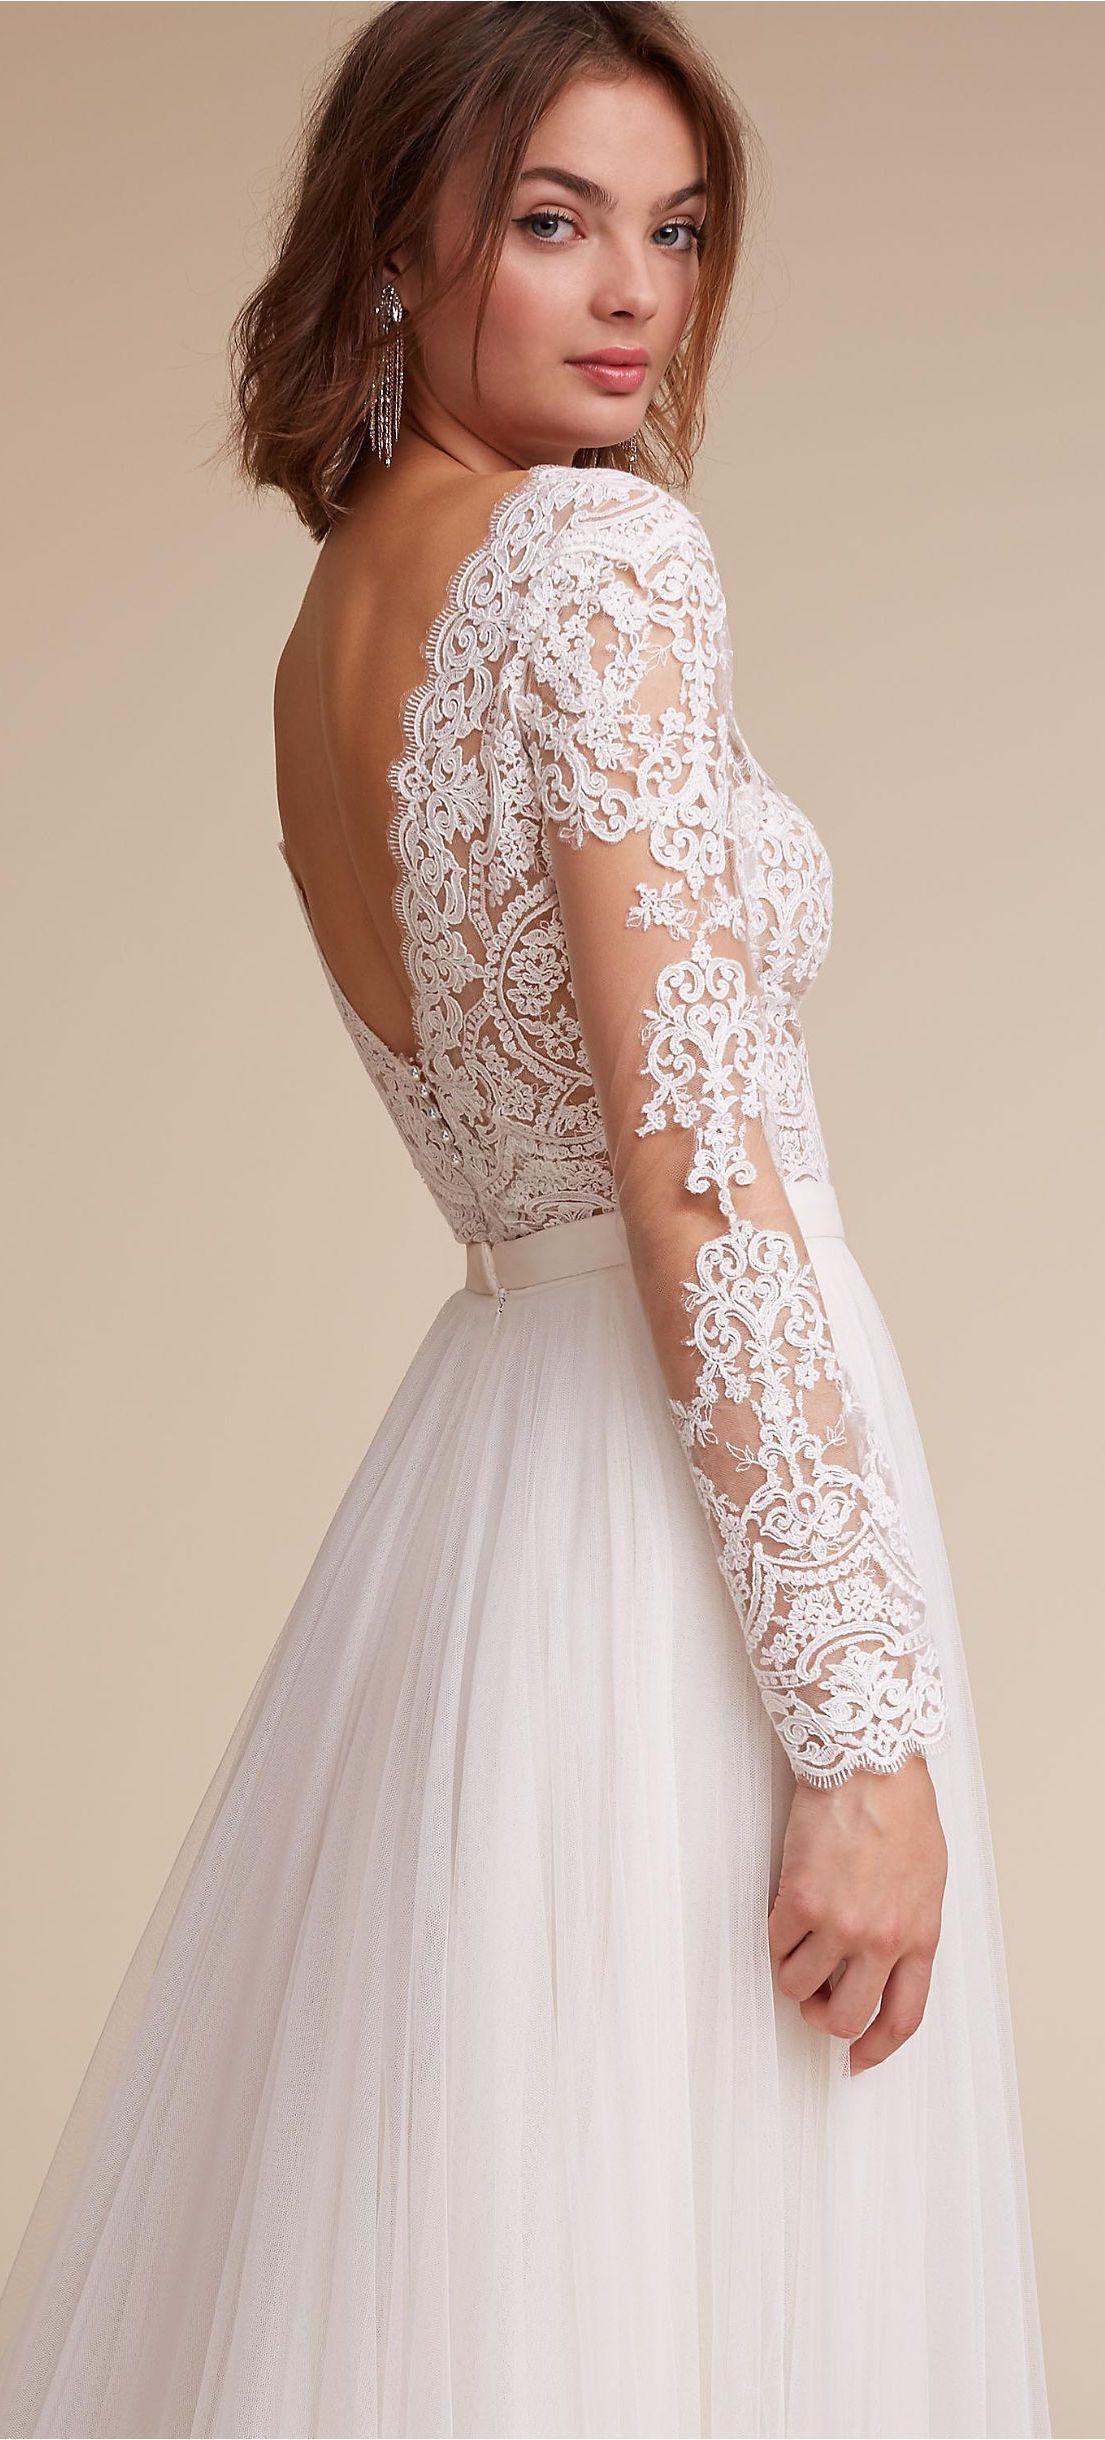 Sheer long sleeve wedding dresses  Longsleeve lace wedding dress by BHLDN  Lace Wedding Dresses